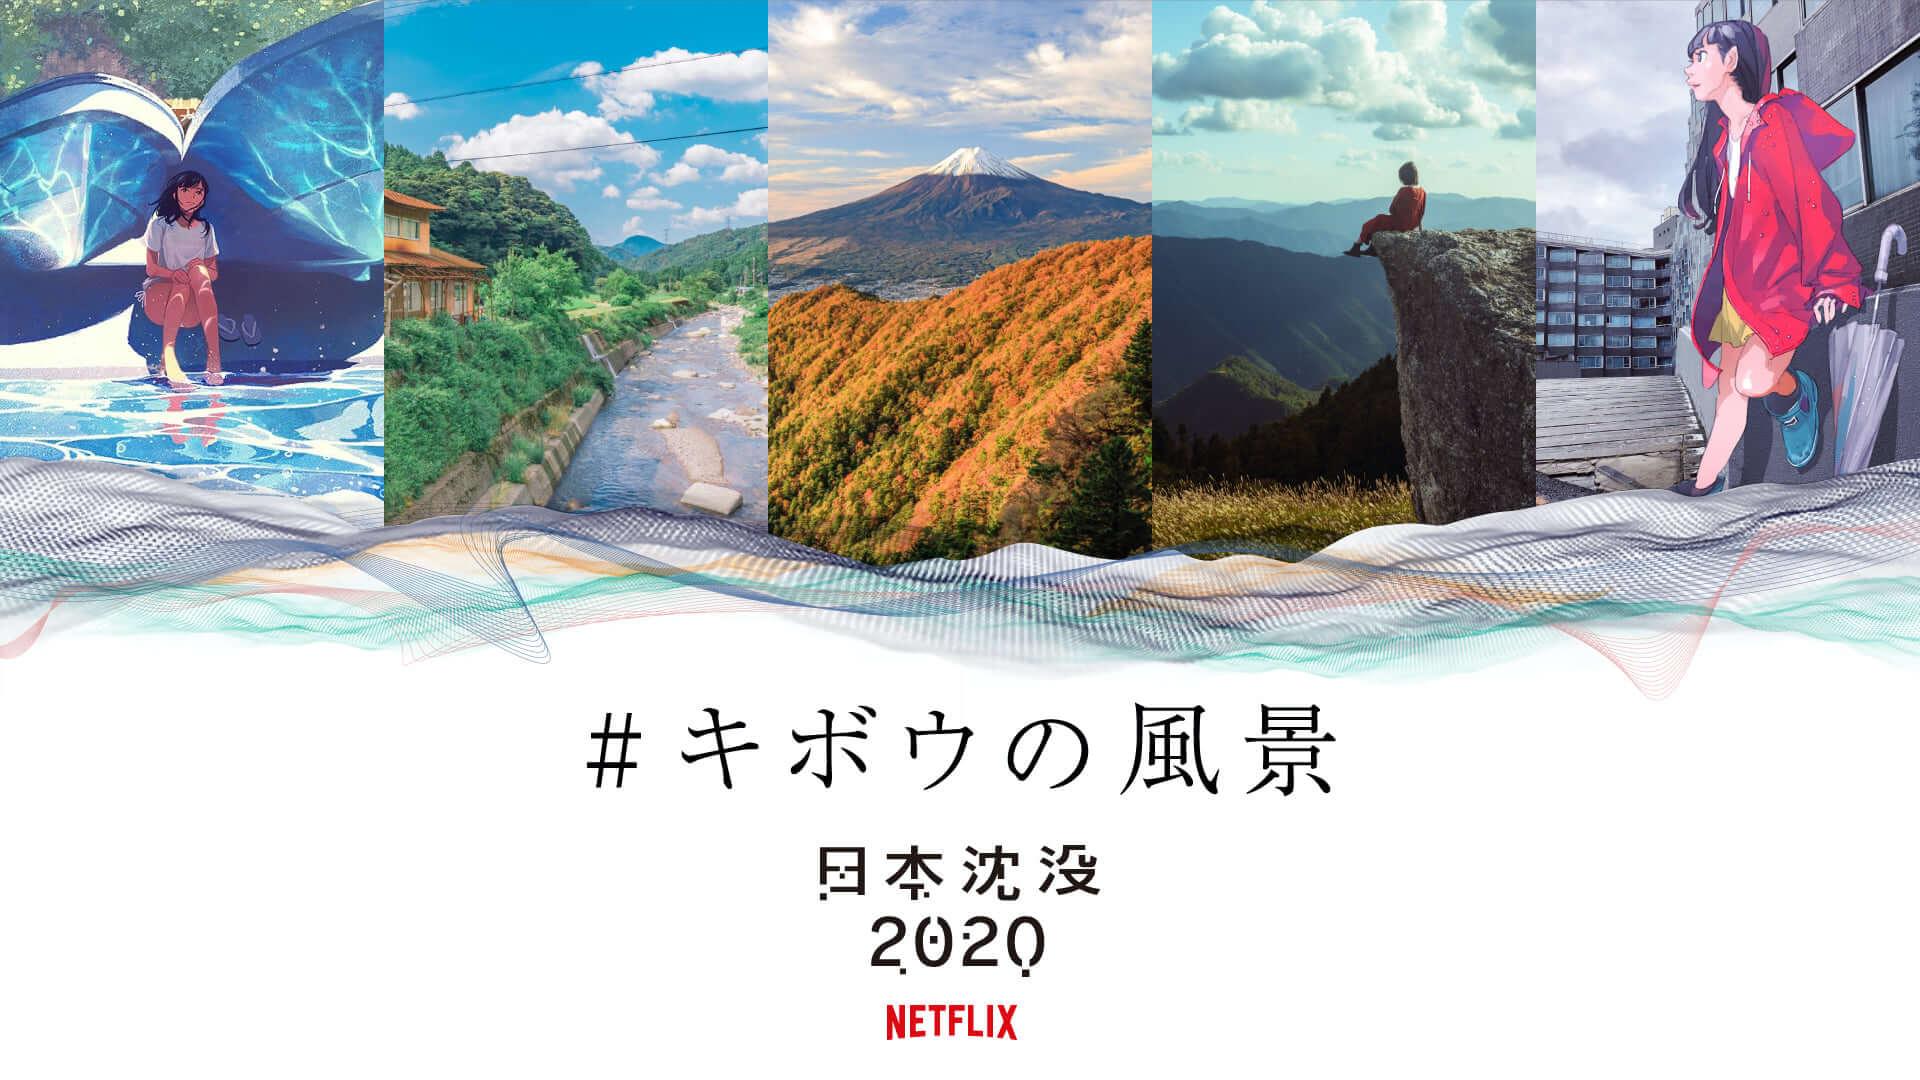 Netflix『日本沈没2020』のスピンオフ企画「シズマヌキボウ」が始動!向井太一、Daichi Yamamotoら参加のオリジナル曲が近日公開 art200710_japansinks_1-1920x1080